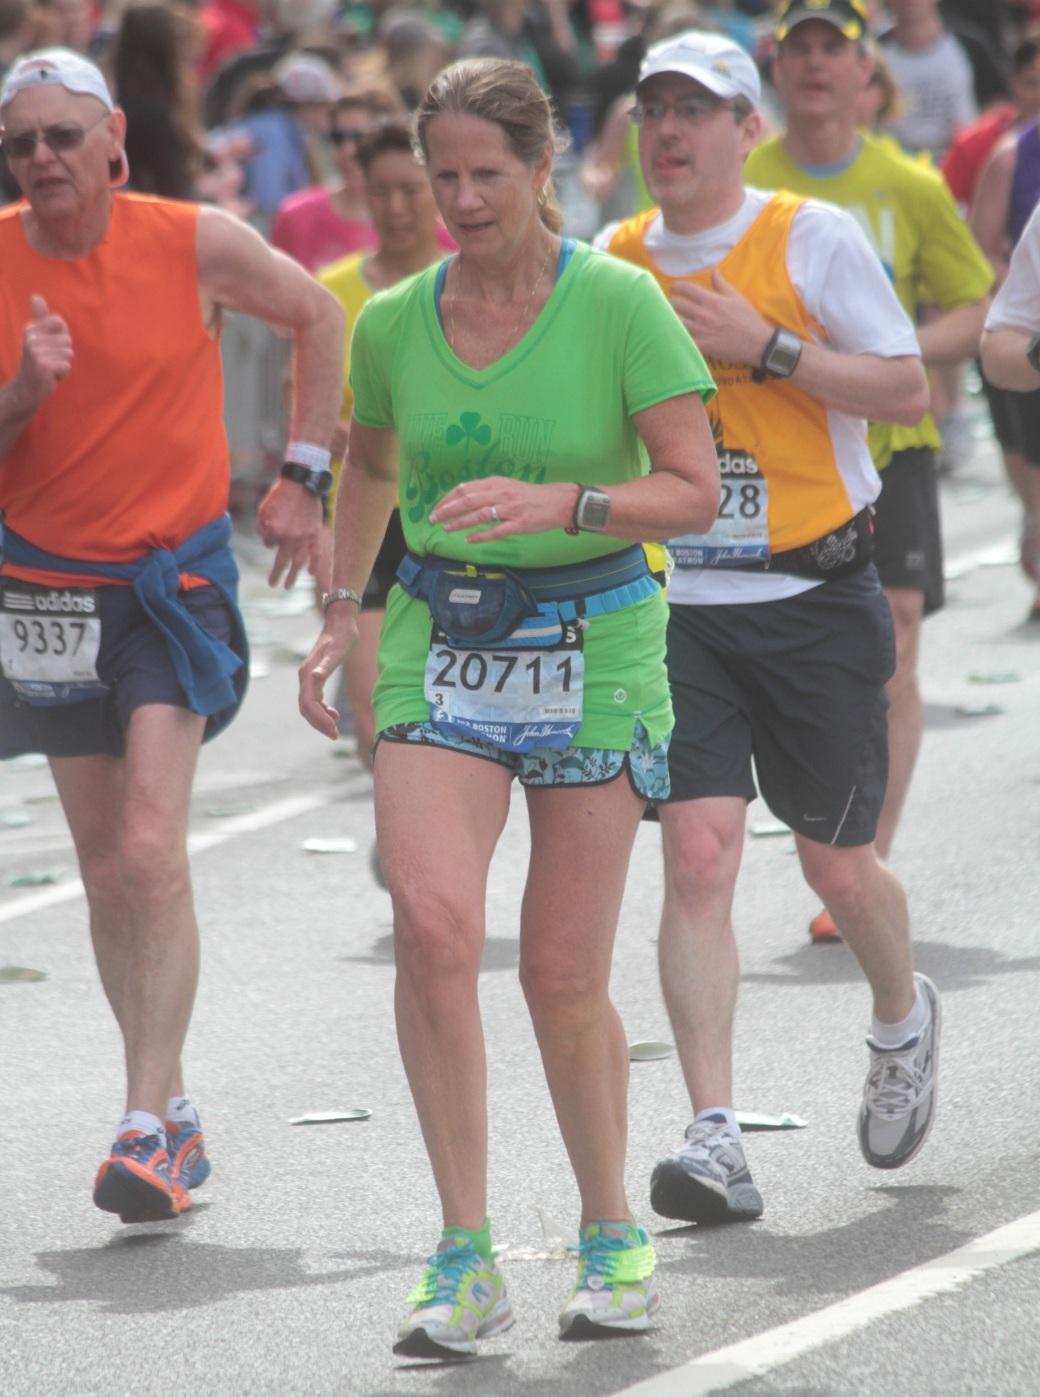 boston marathon 2013 number 20711